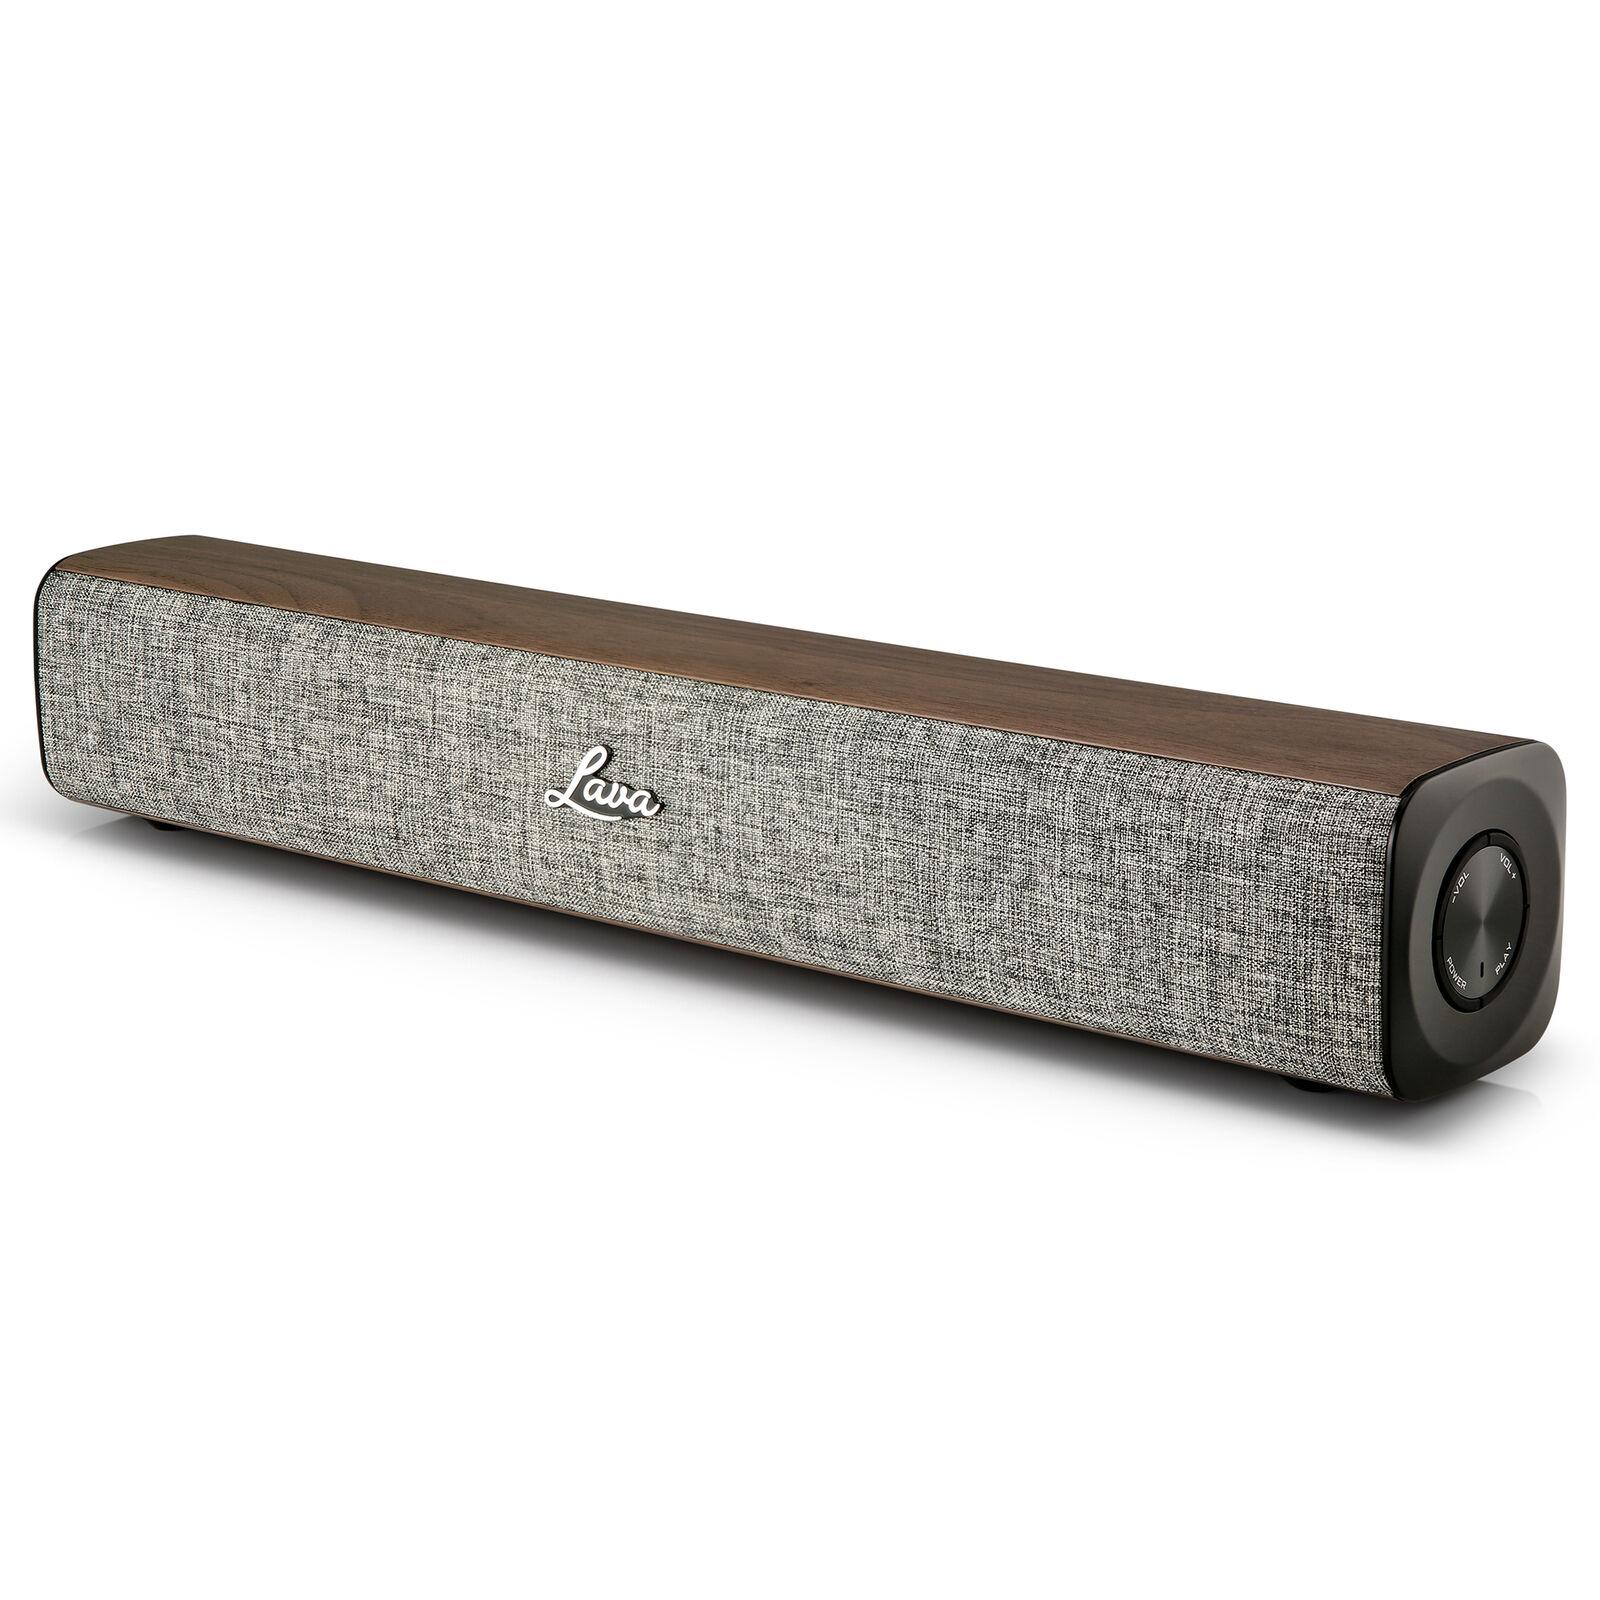 Lava Kahula Mini Sound Bar Portable Bluetooth Speaker - Grey/Walnut £24.99 at 3monkeys eBay